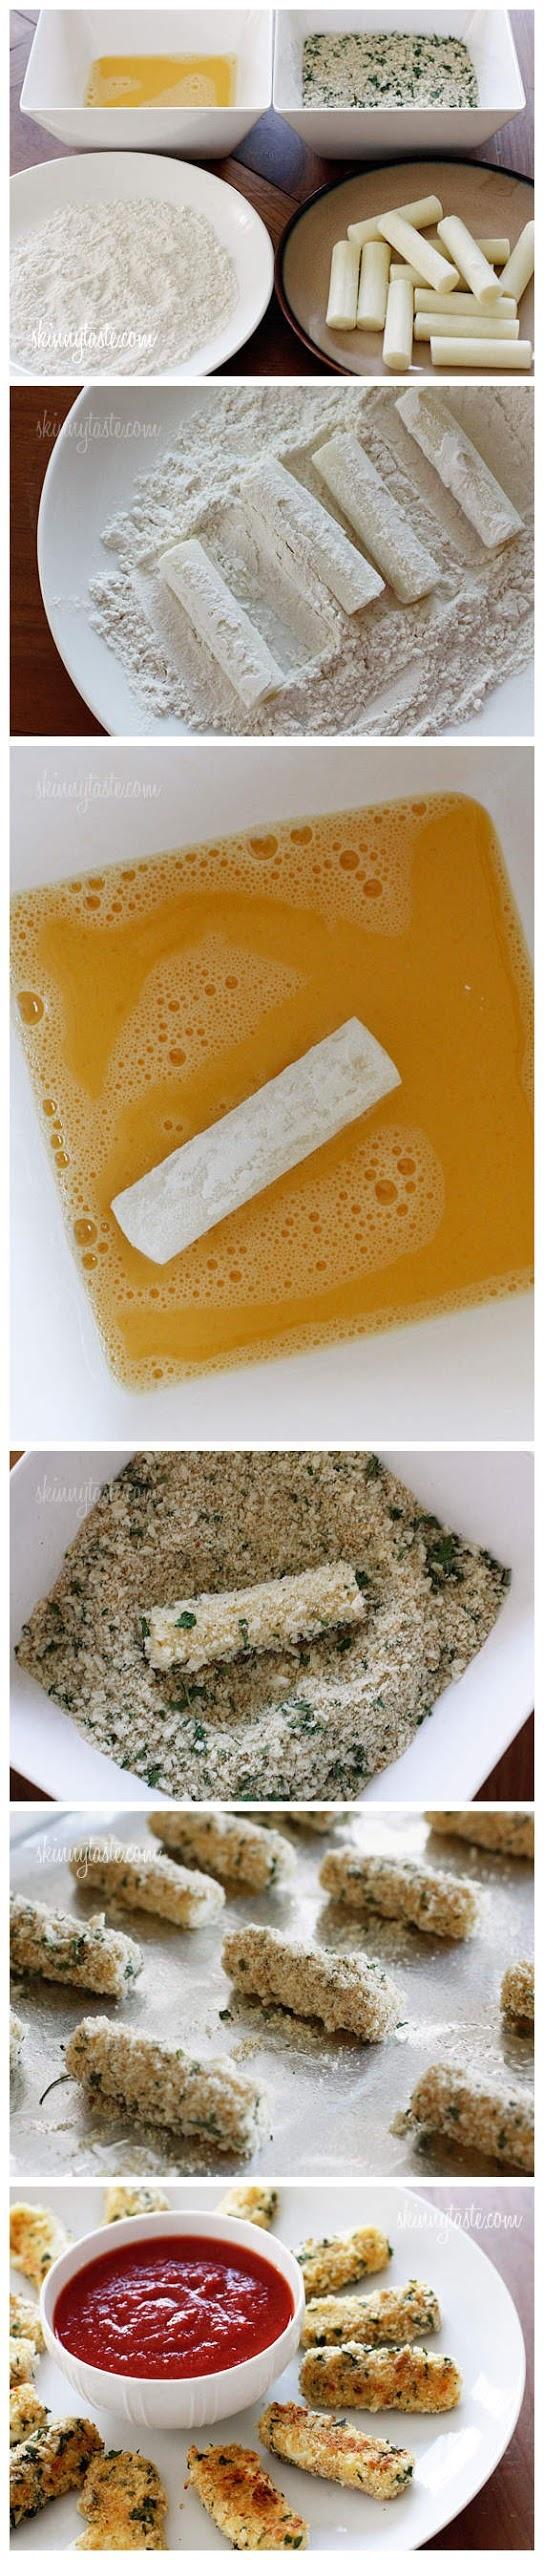 Pin by erika rasmussen on cooking and baking pinterest